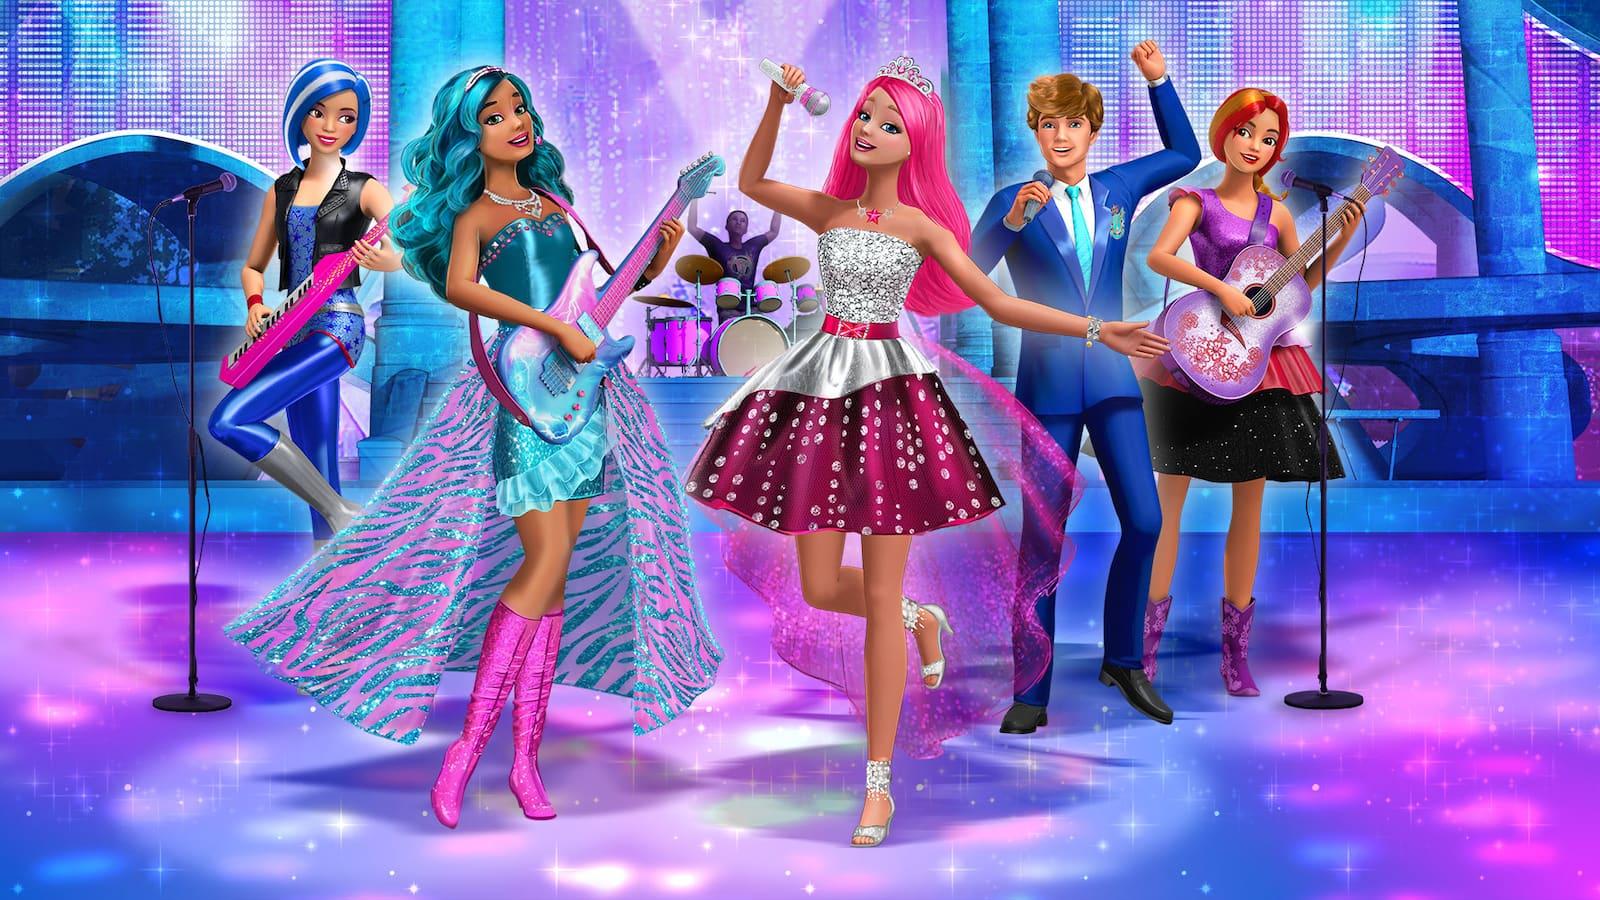 barbie-i-rock-n-royals-prinsessa-pa-rockaventyr-2015